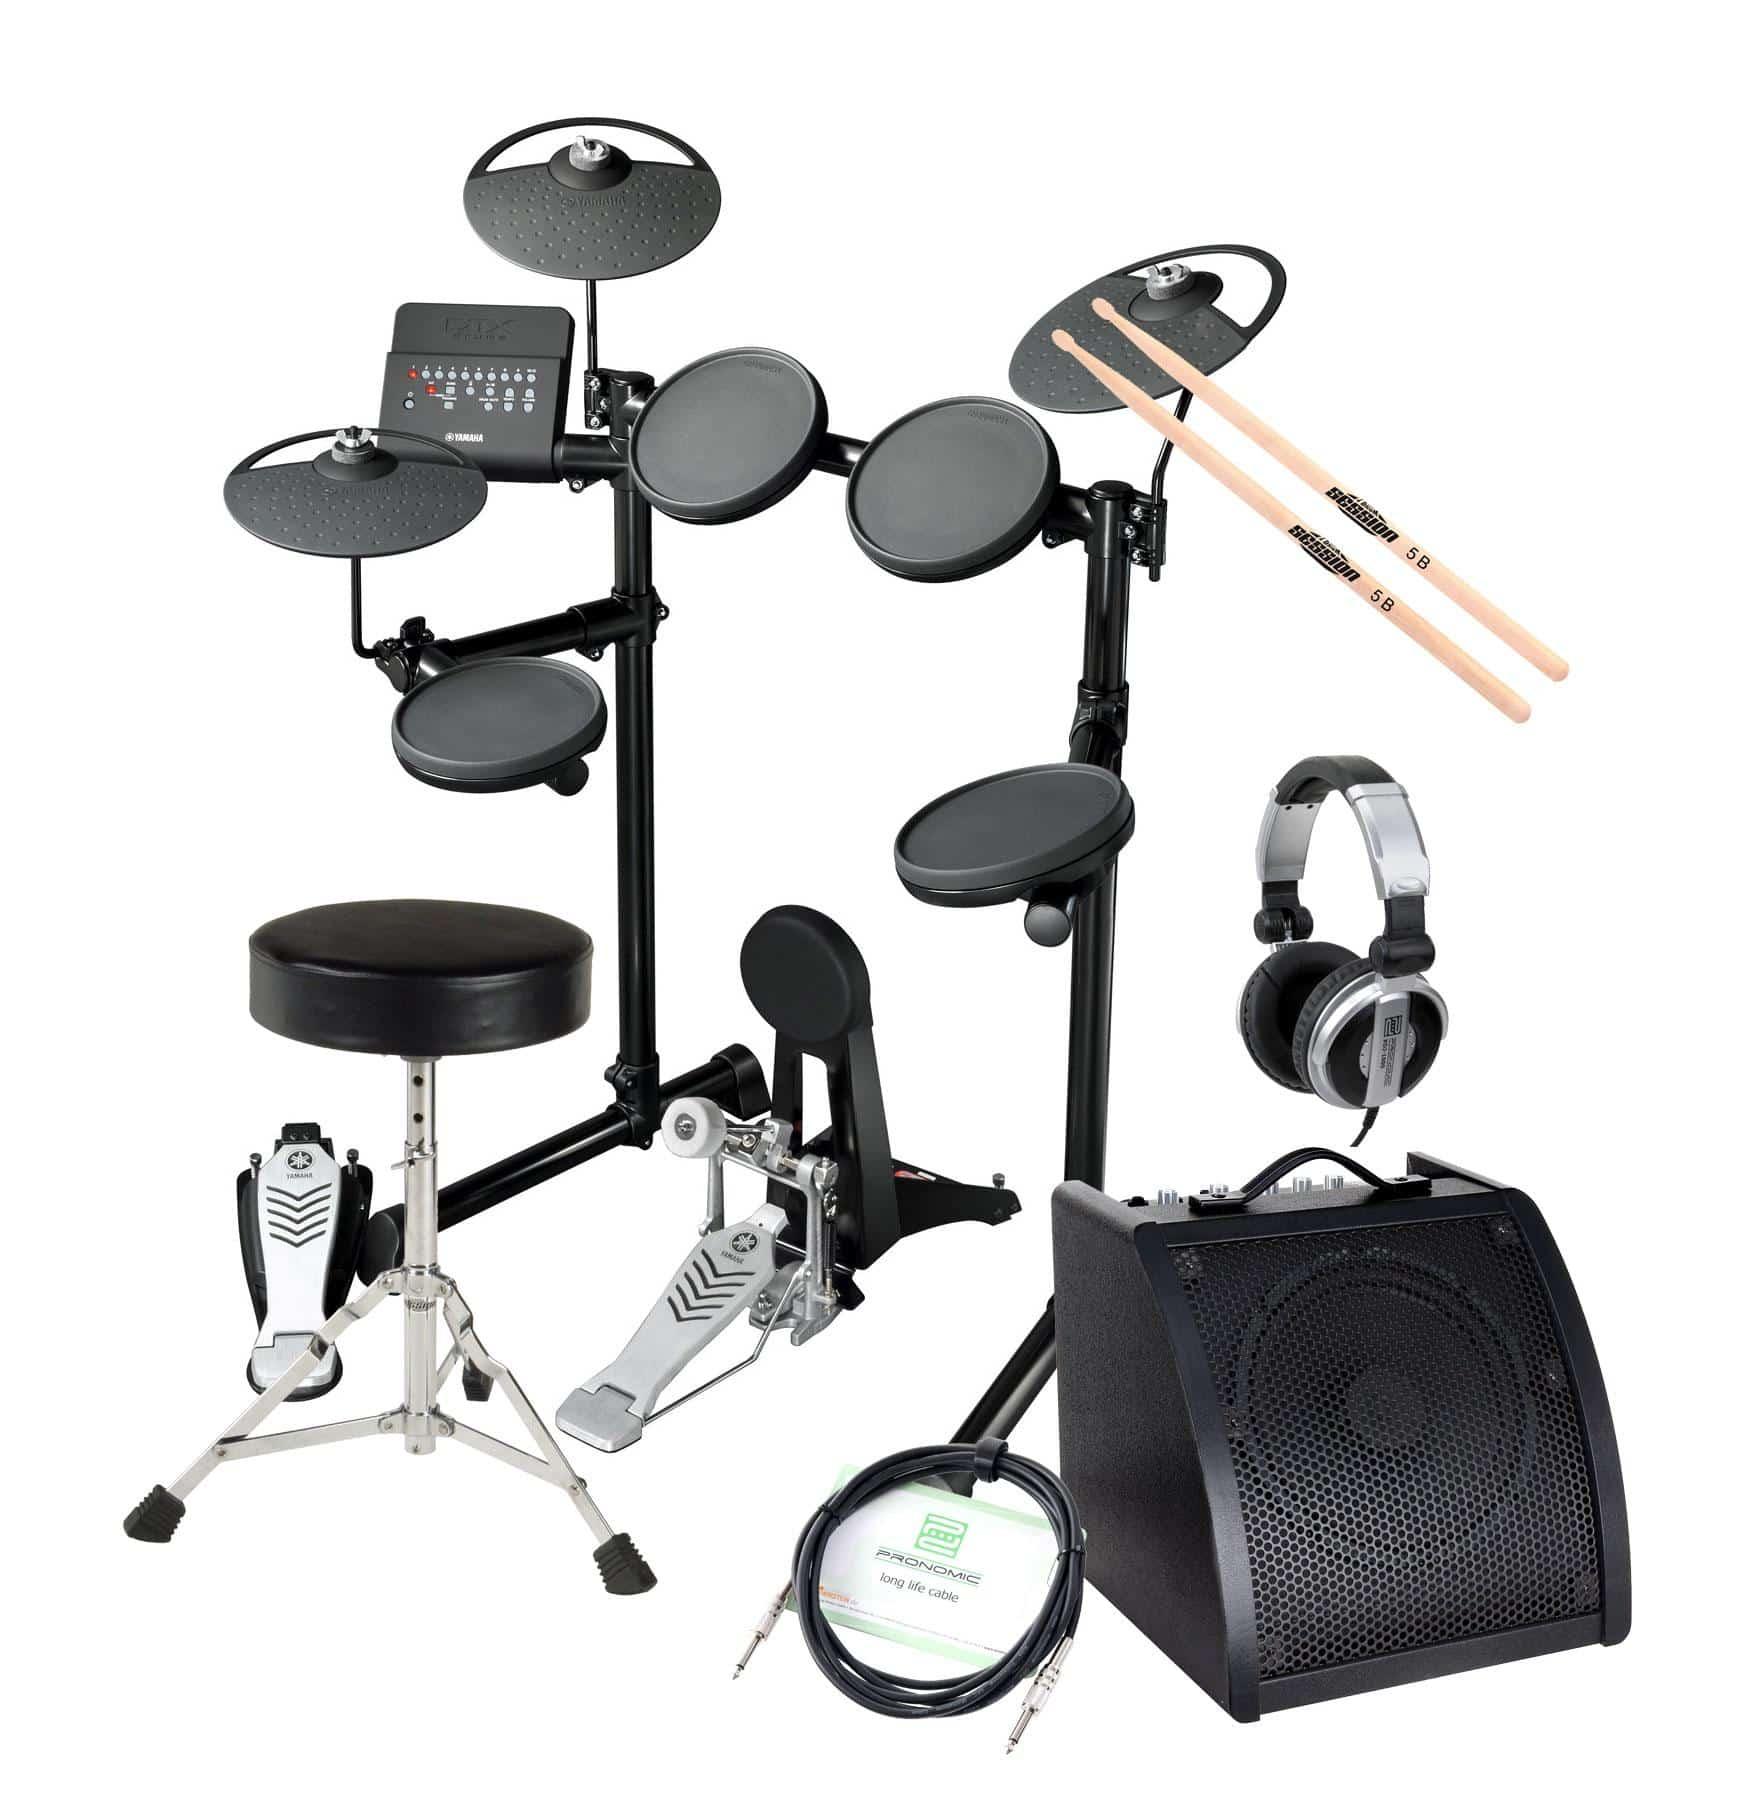 Yamaha DTX430K Compact E Drum SET inkl. Verstärker Kopfhörer Drumhocker Sticks